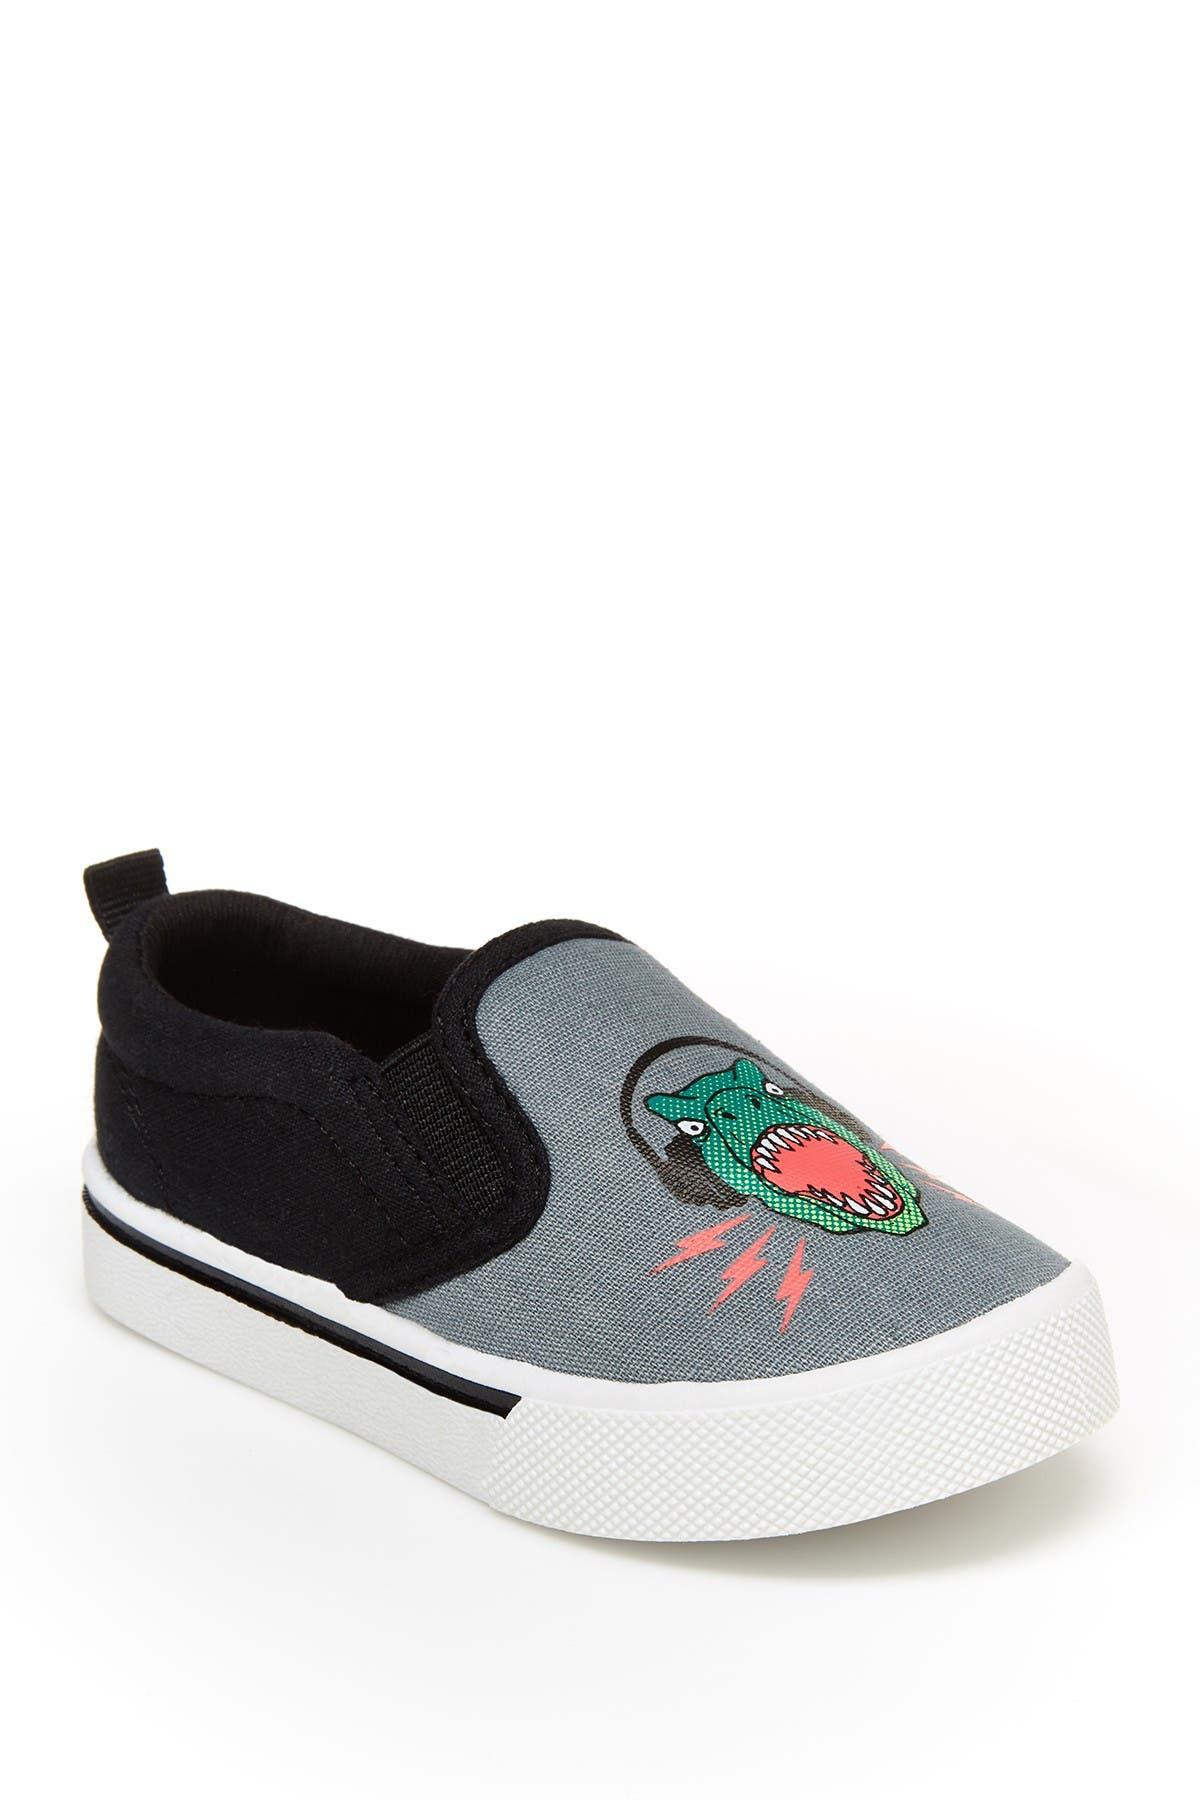 Image of OshKosh Austin Camo Slip-On Sneaker